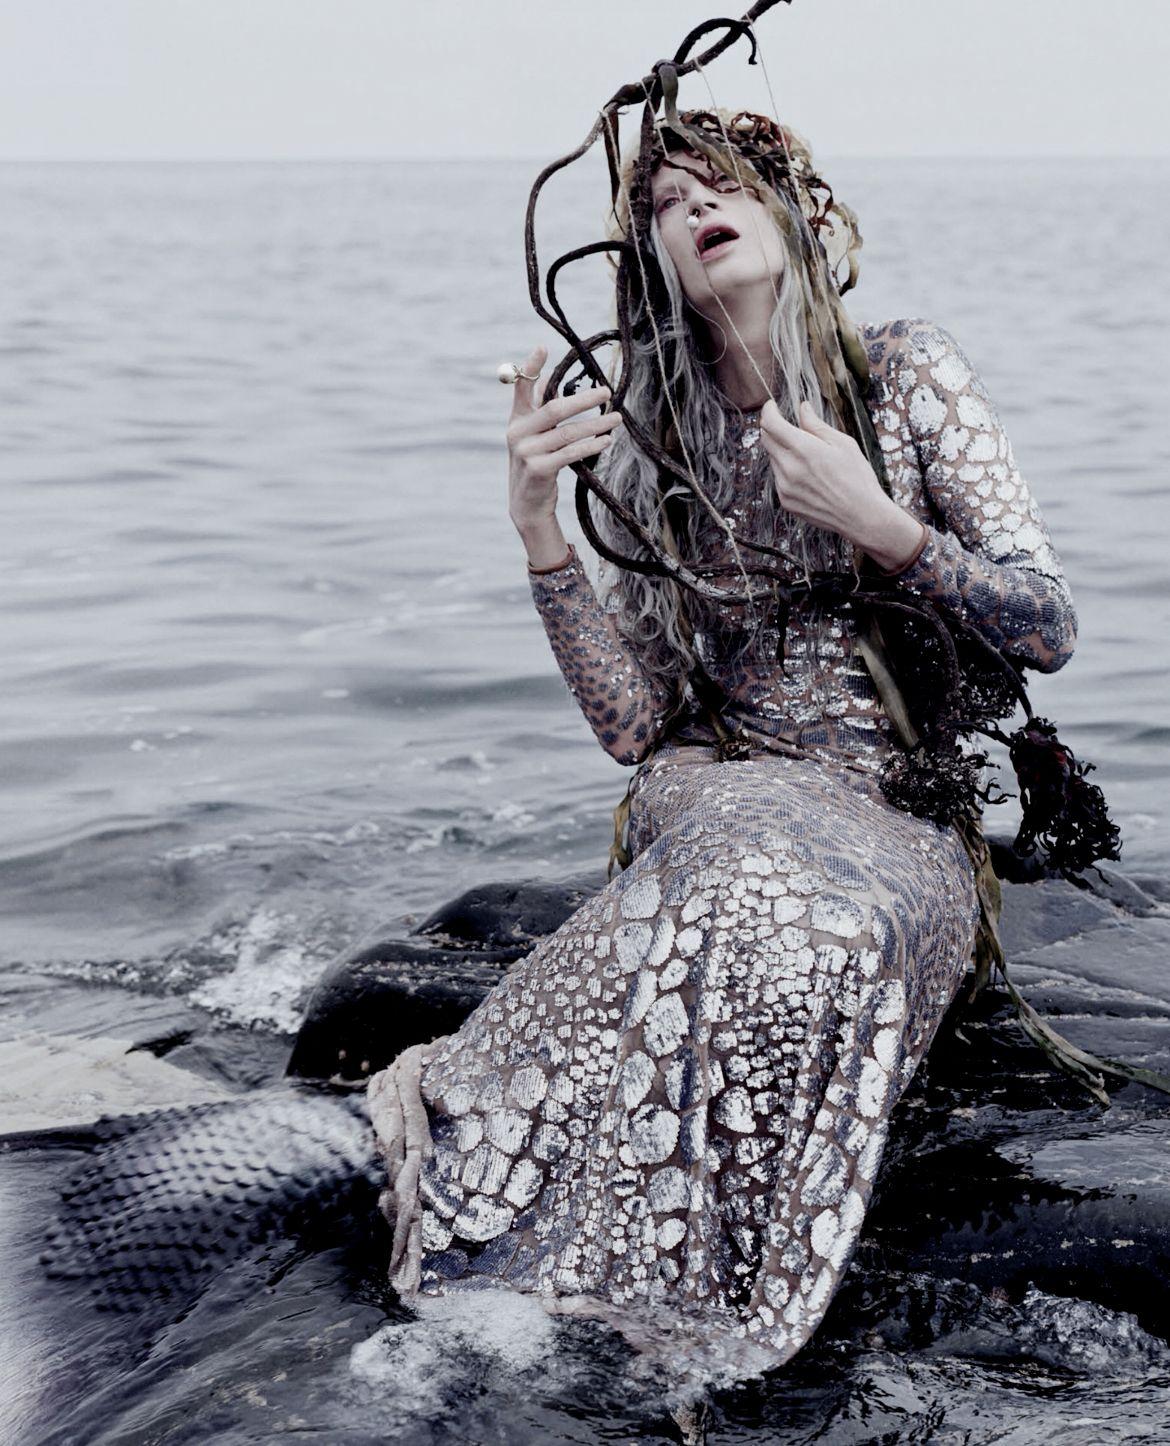 Vfiles Adriana Feregrino 9 Tim Walker Tim Walker Photography Fashion Photography